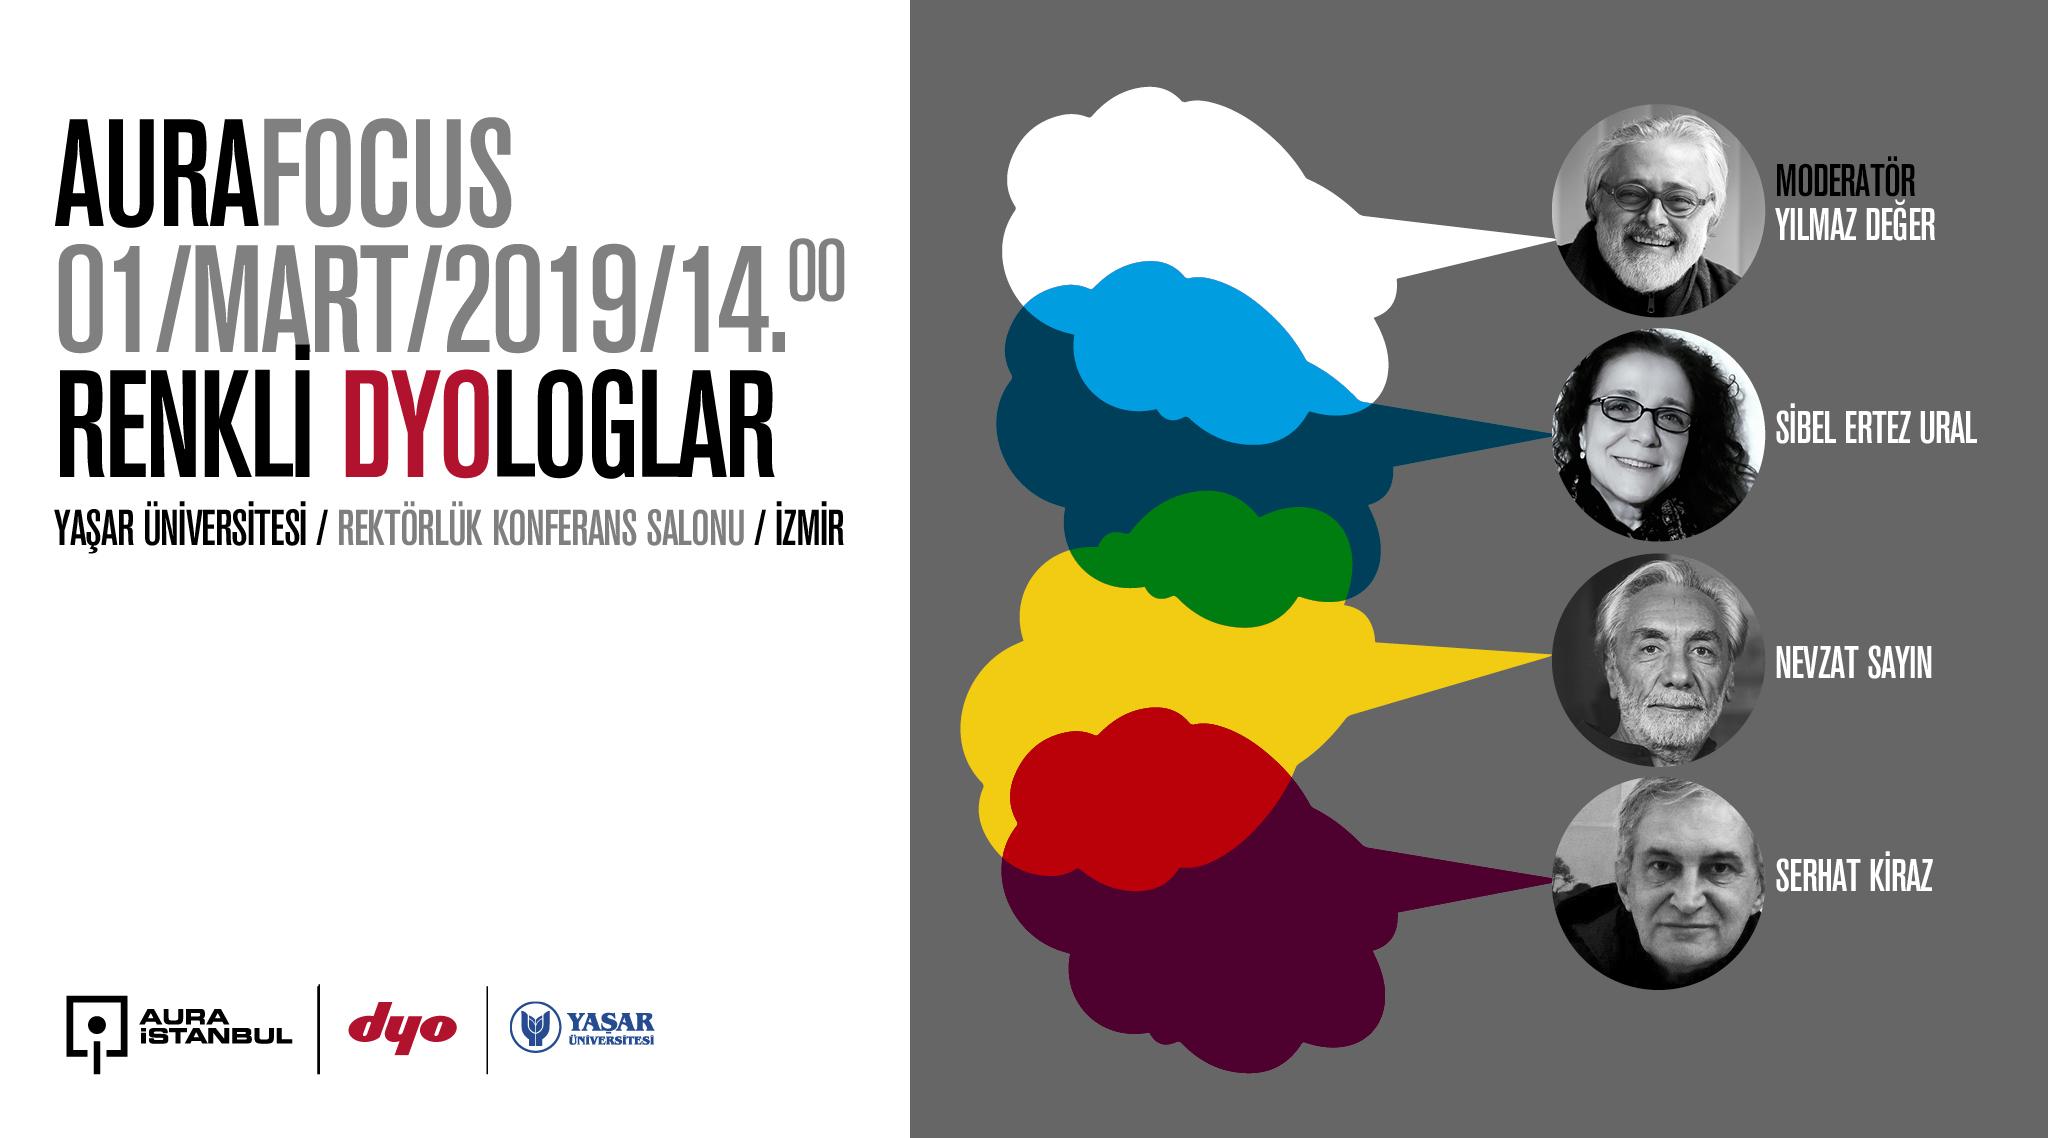 AURA Focus: Renkli DYOloglar